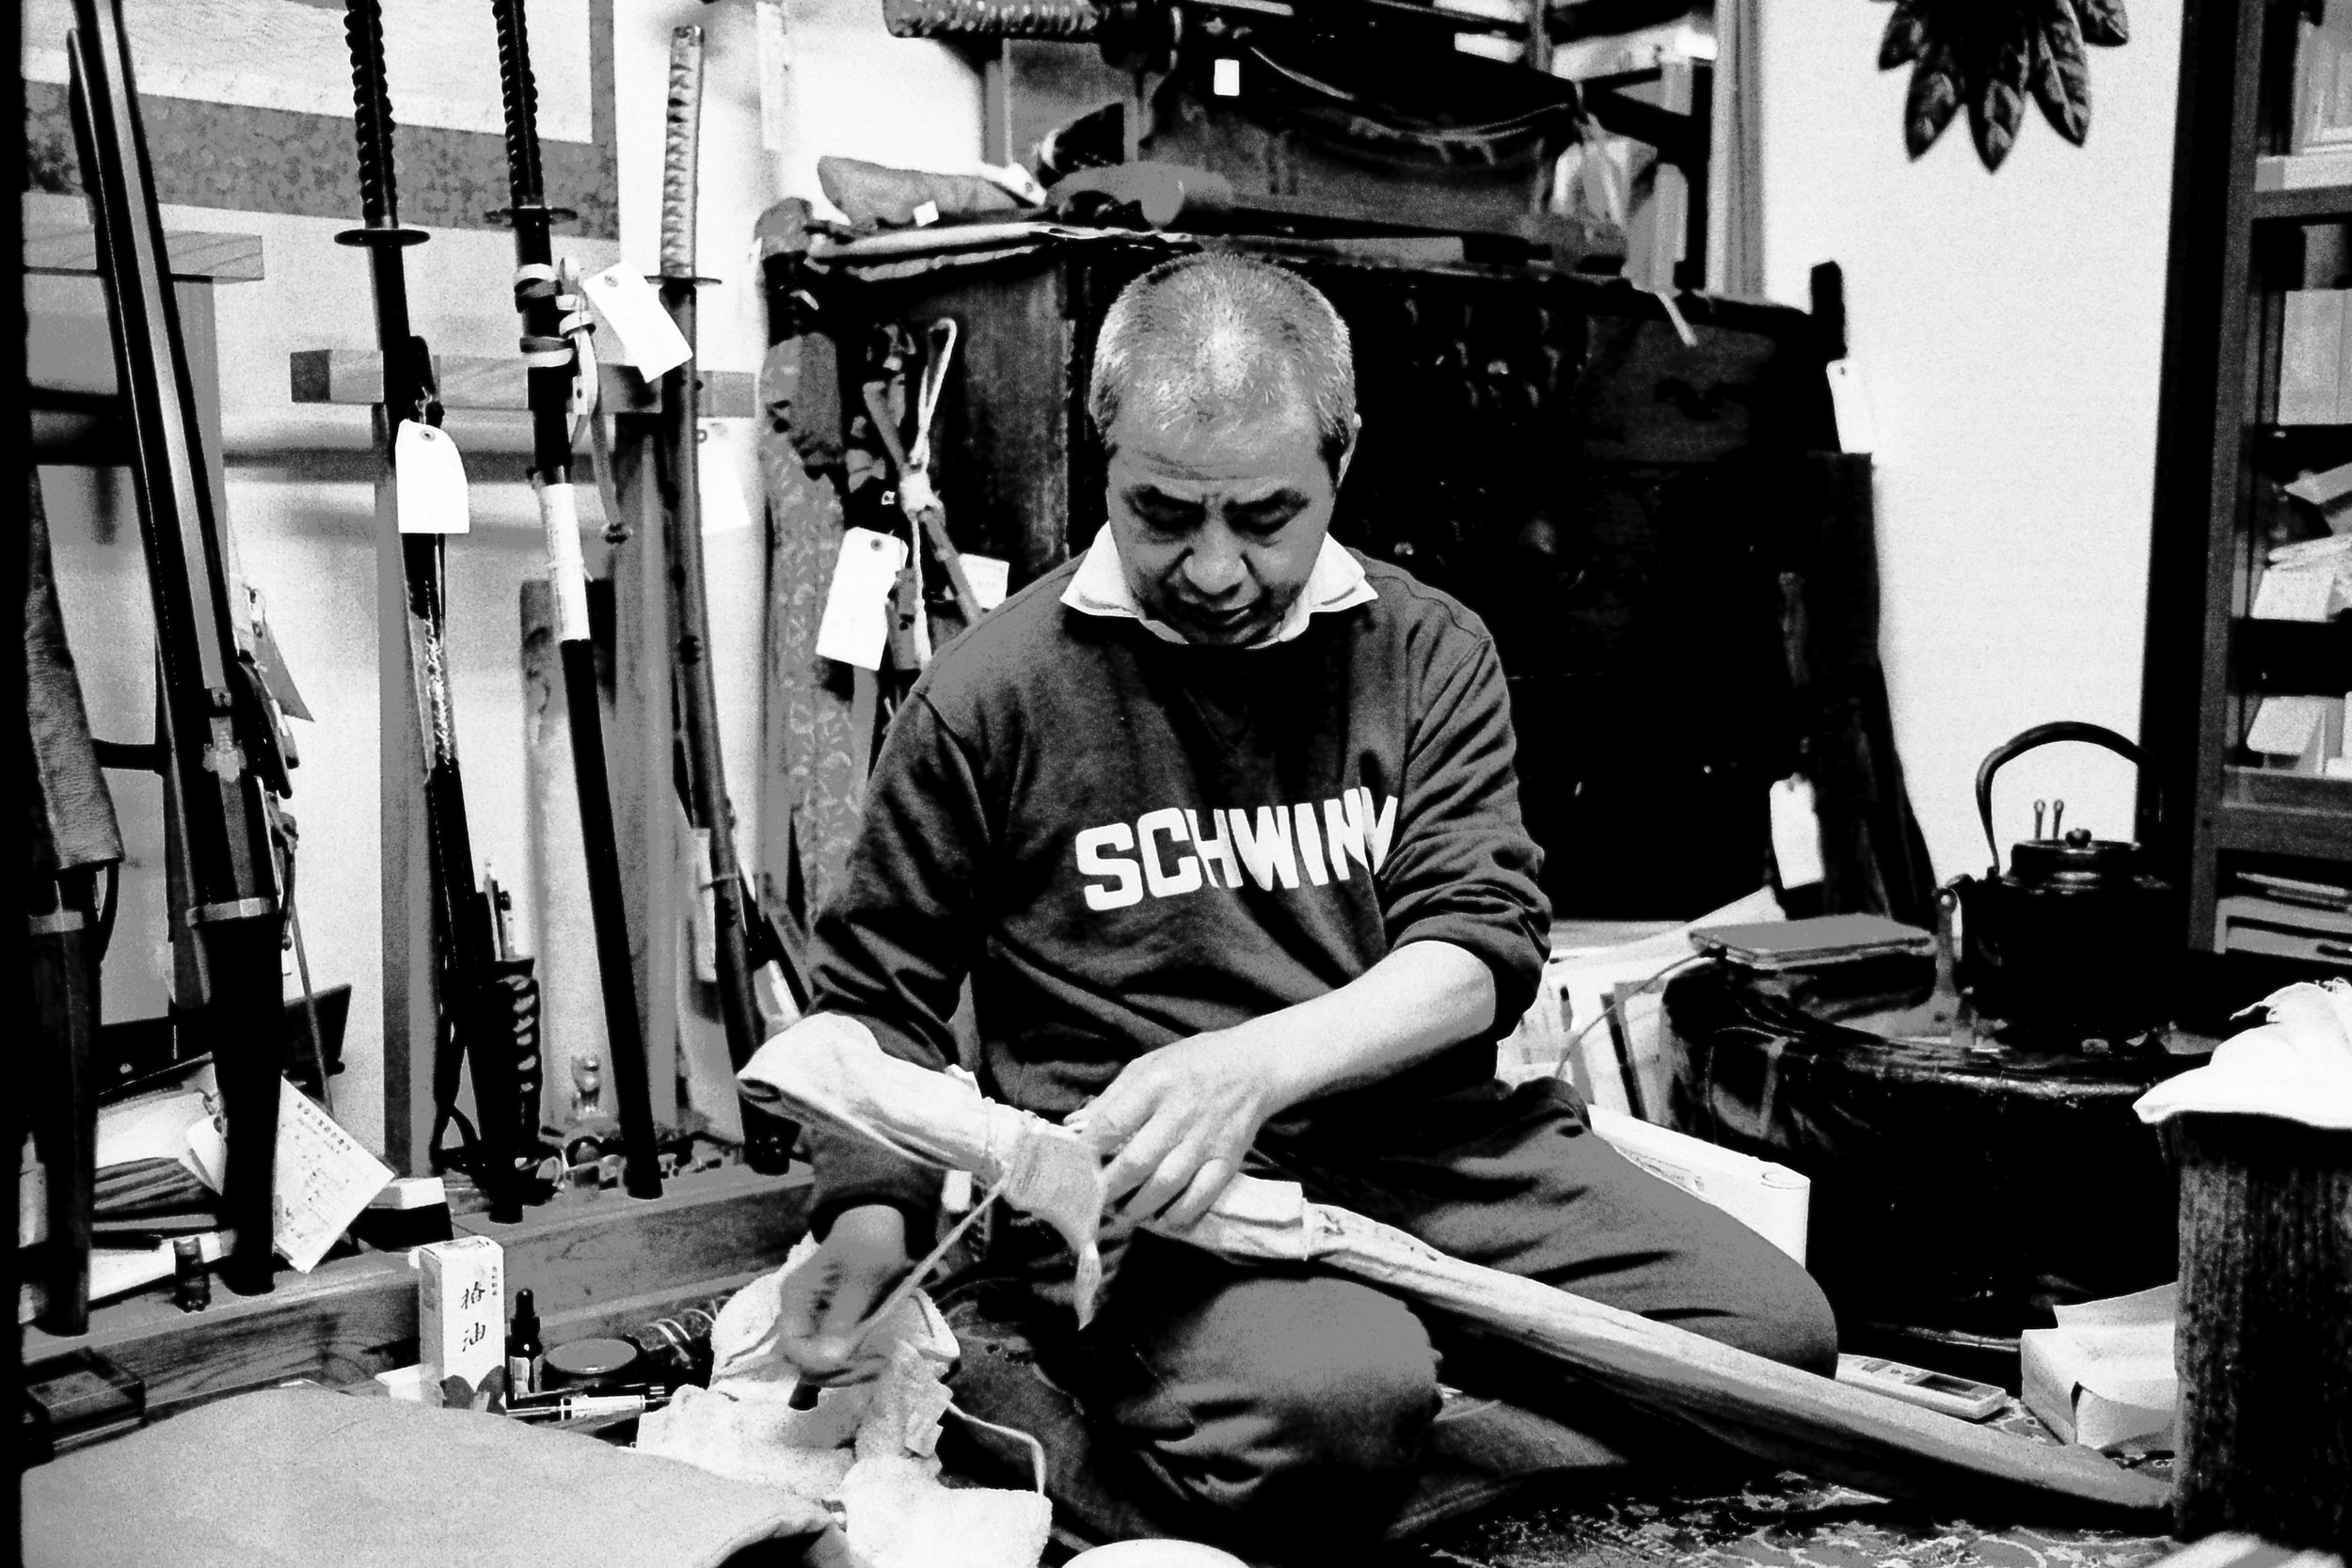 HP5/LeicaM6/Summicron 35  400 year old Samurai Sword from Musashi Province (Terushige Shibahara lineage).